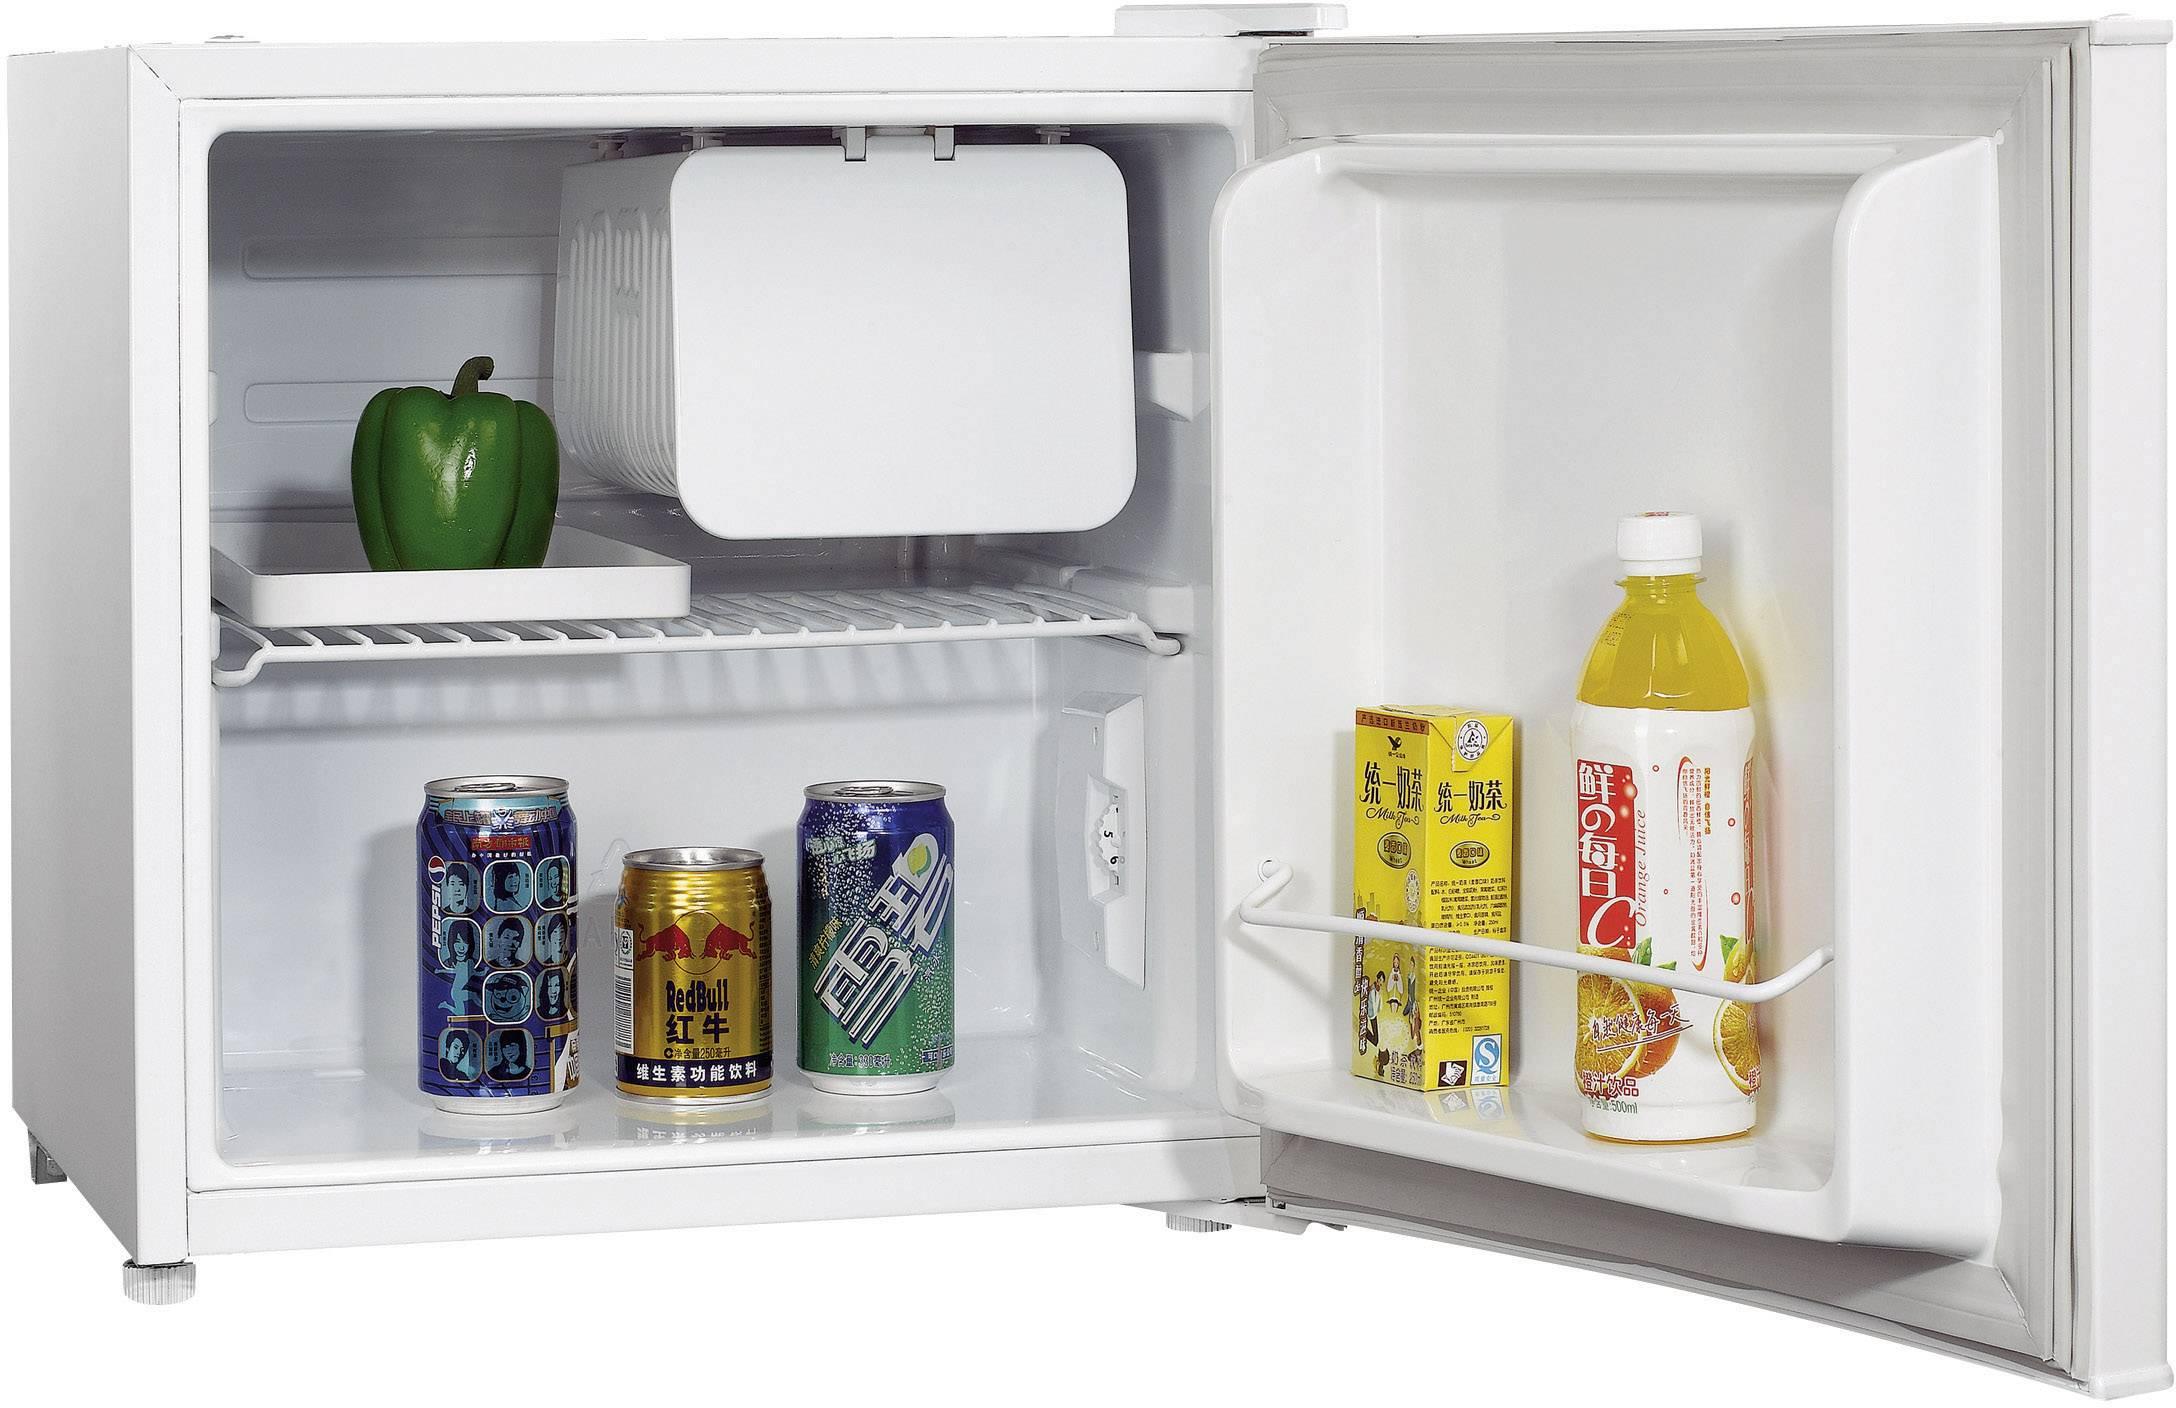 Side By Side Kühlschrank Conrad : Silva homeline silva kb mini kühlschrank kühlschrank l